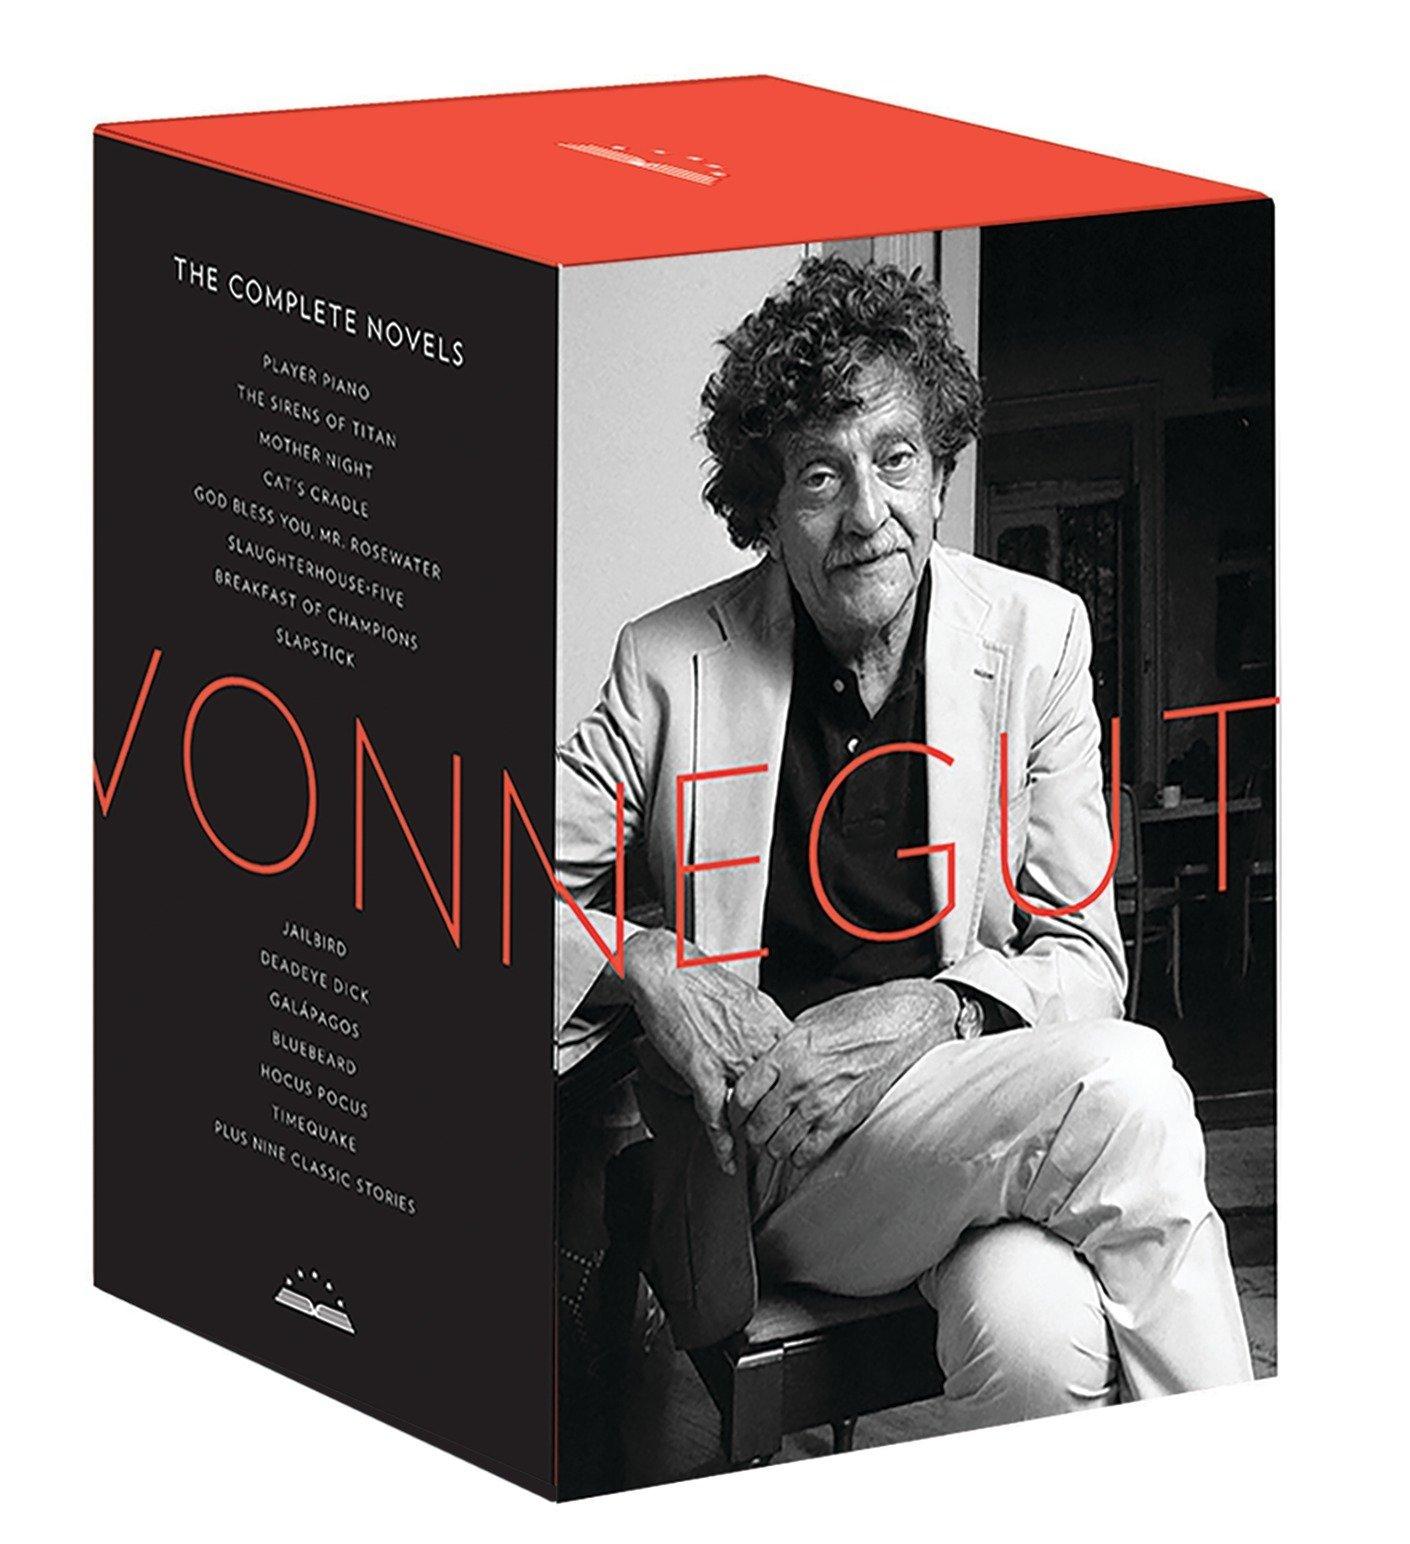 Kurt Vonnegut: The Complete Novels: A Library of America Boxed Set